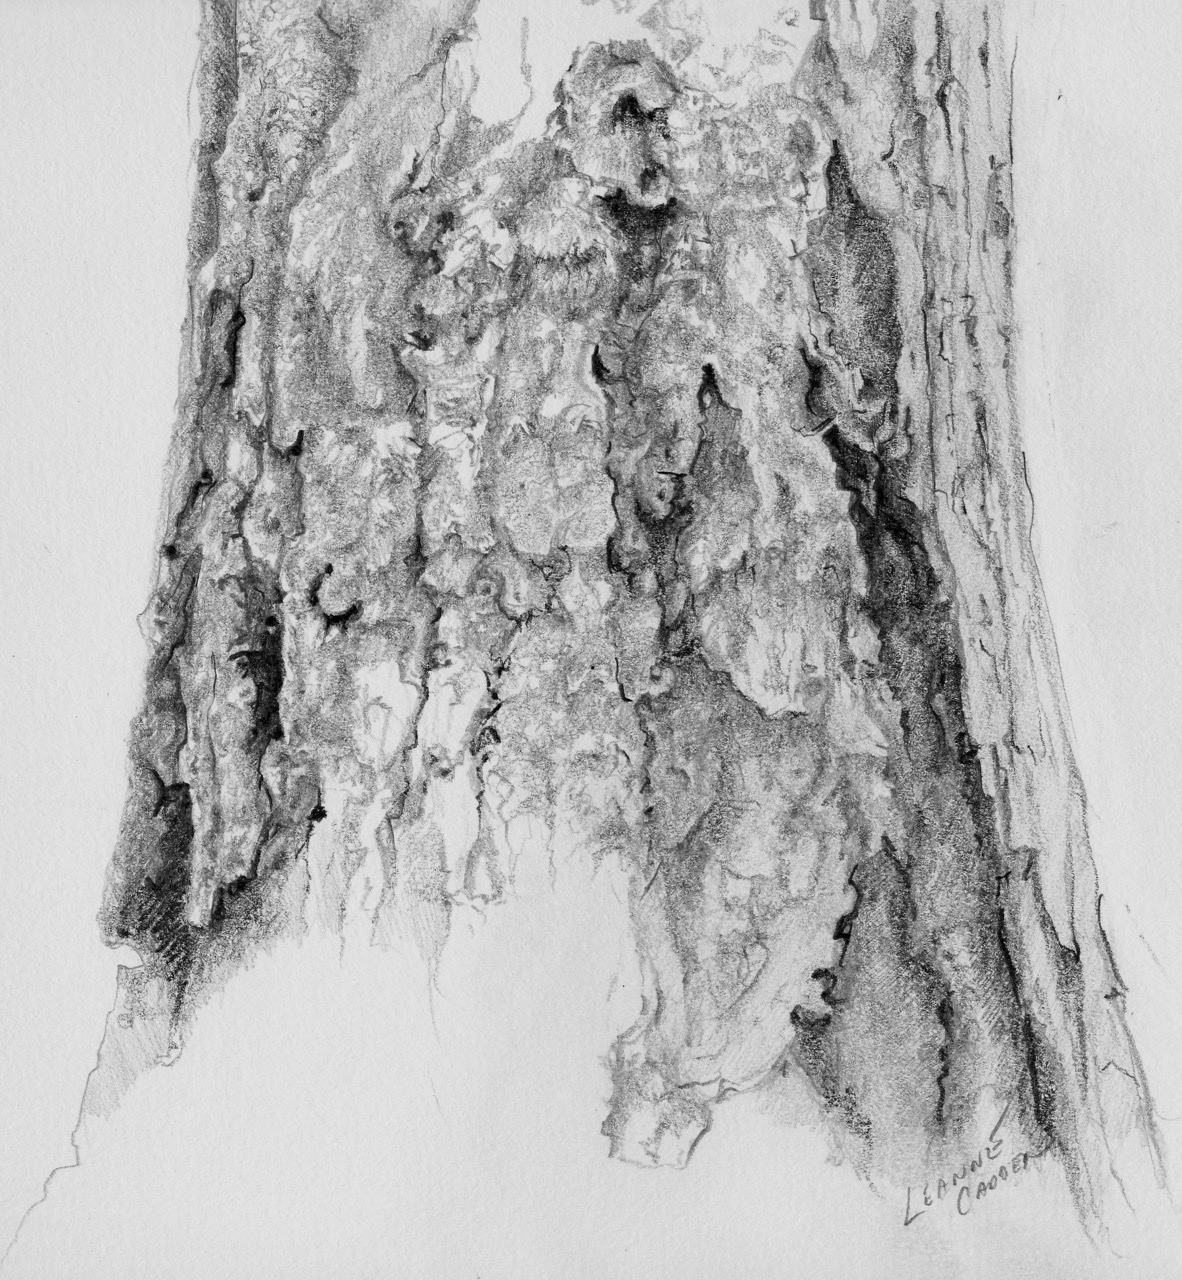 Douglas fir tree sketch